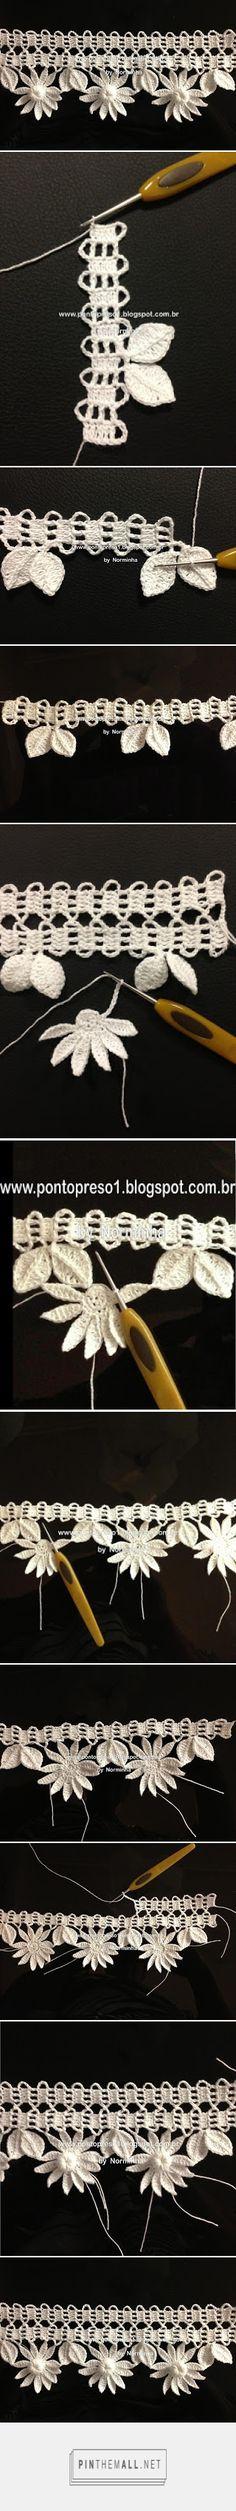 motivi crochet bordi - tecnica - created via http://pinthemall.net